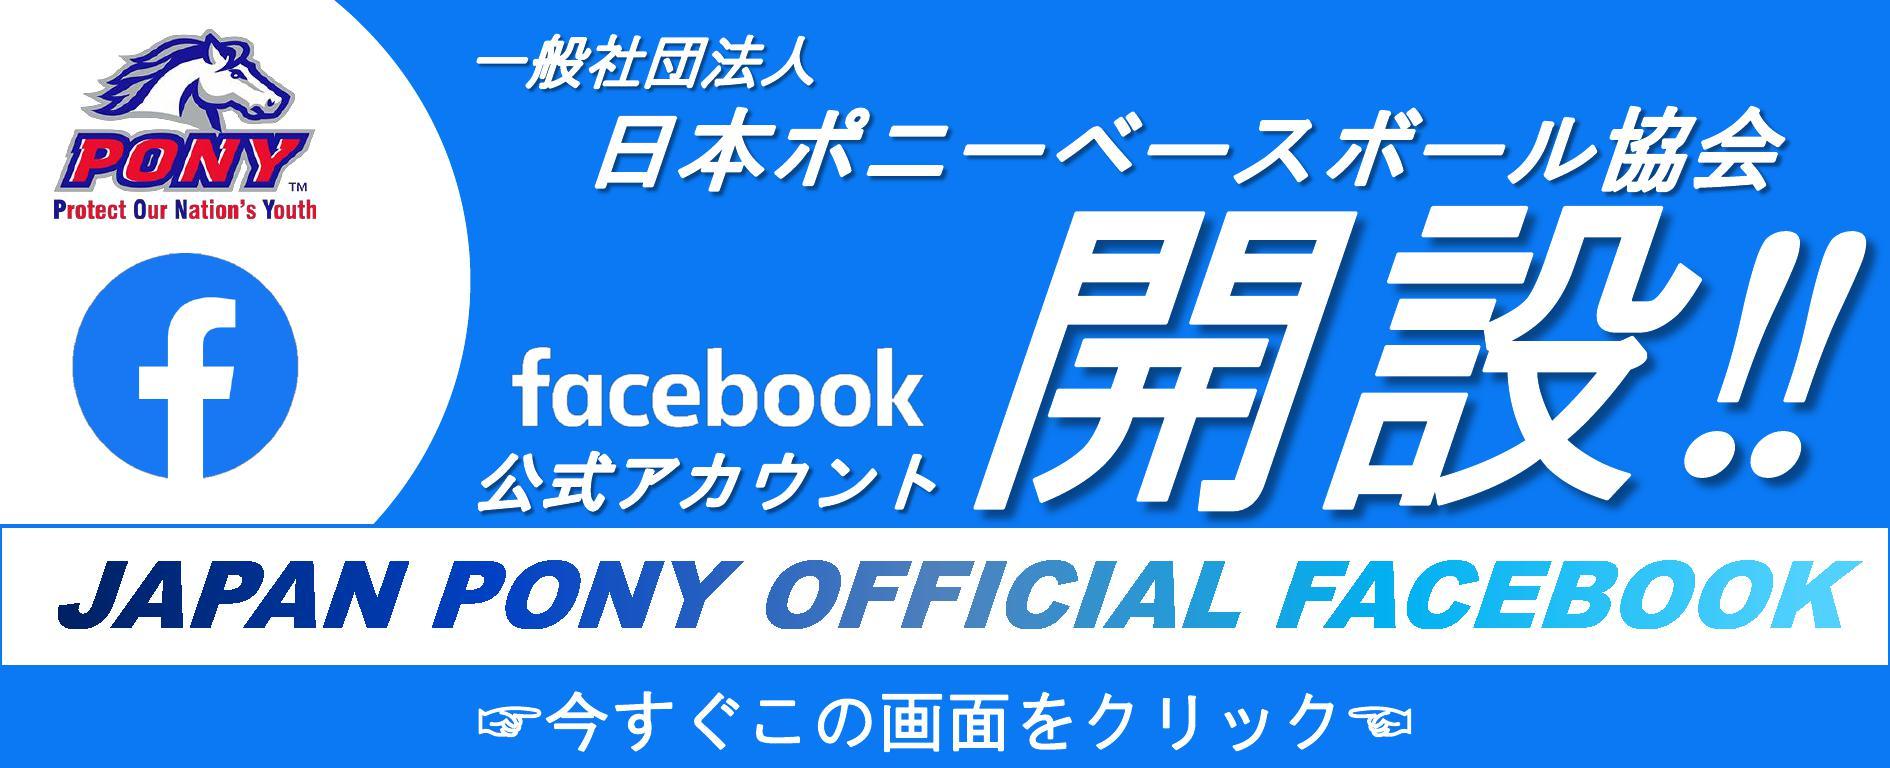 PONY公式Facebookアカウントを開設